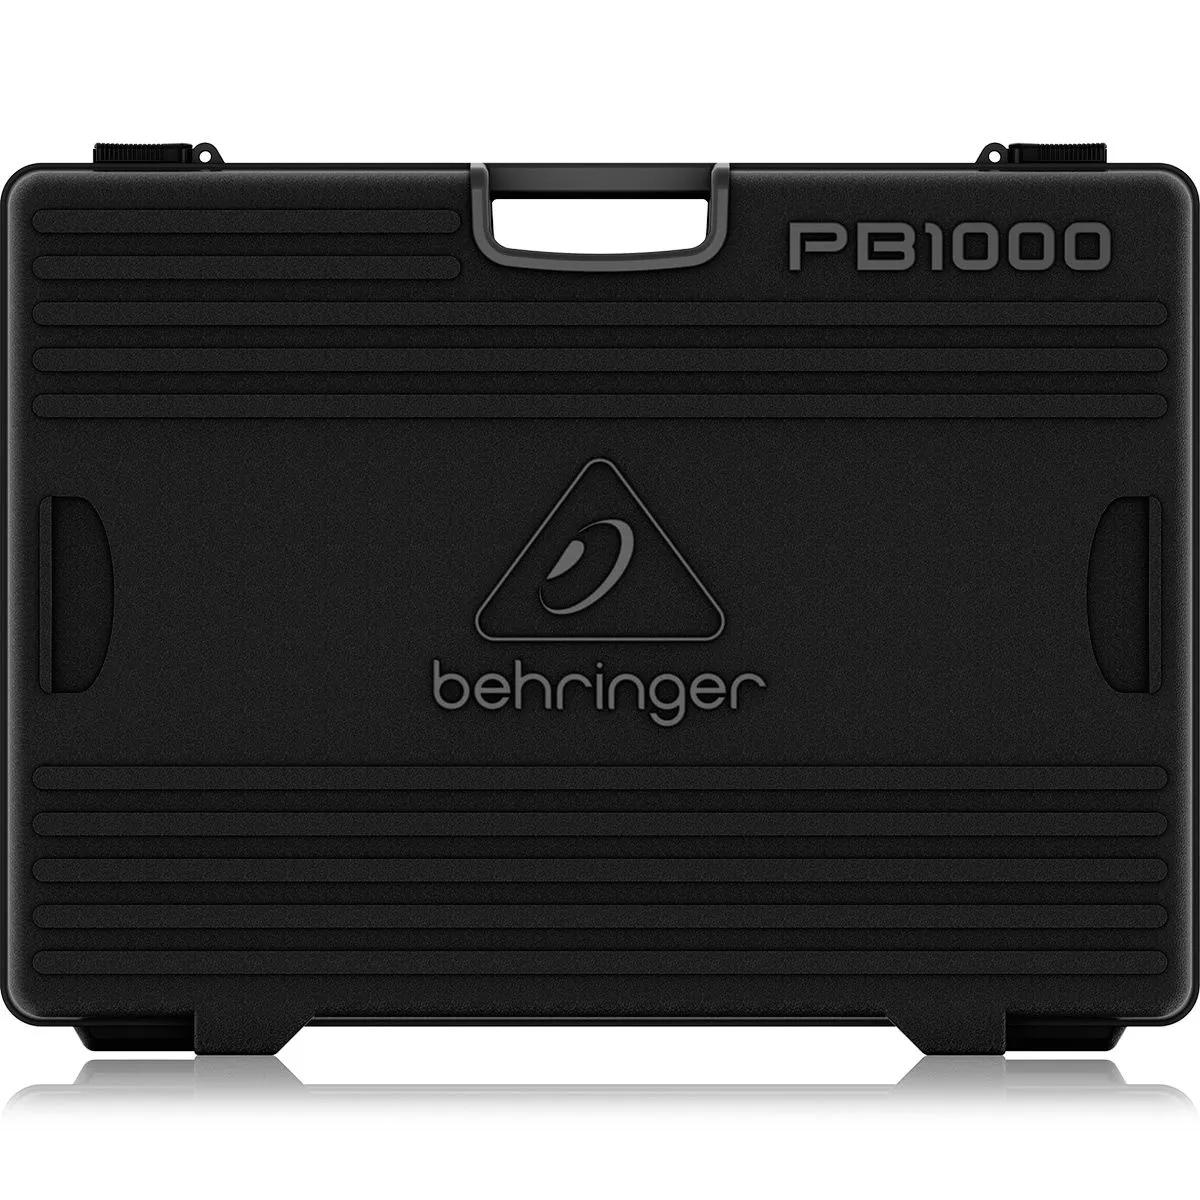 Pedalboard Behringer PB1000 para 12 Pedais